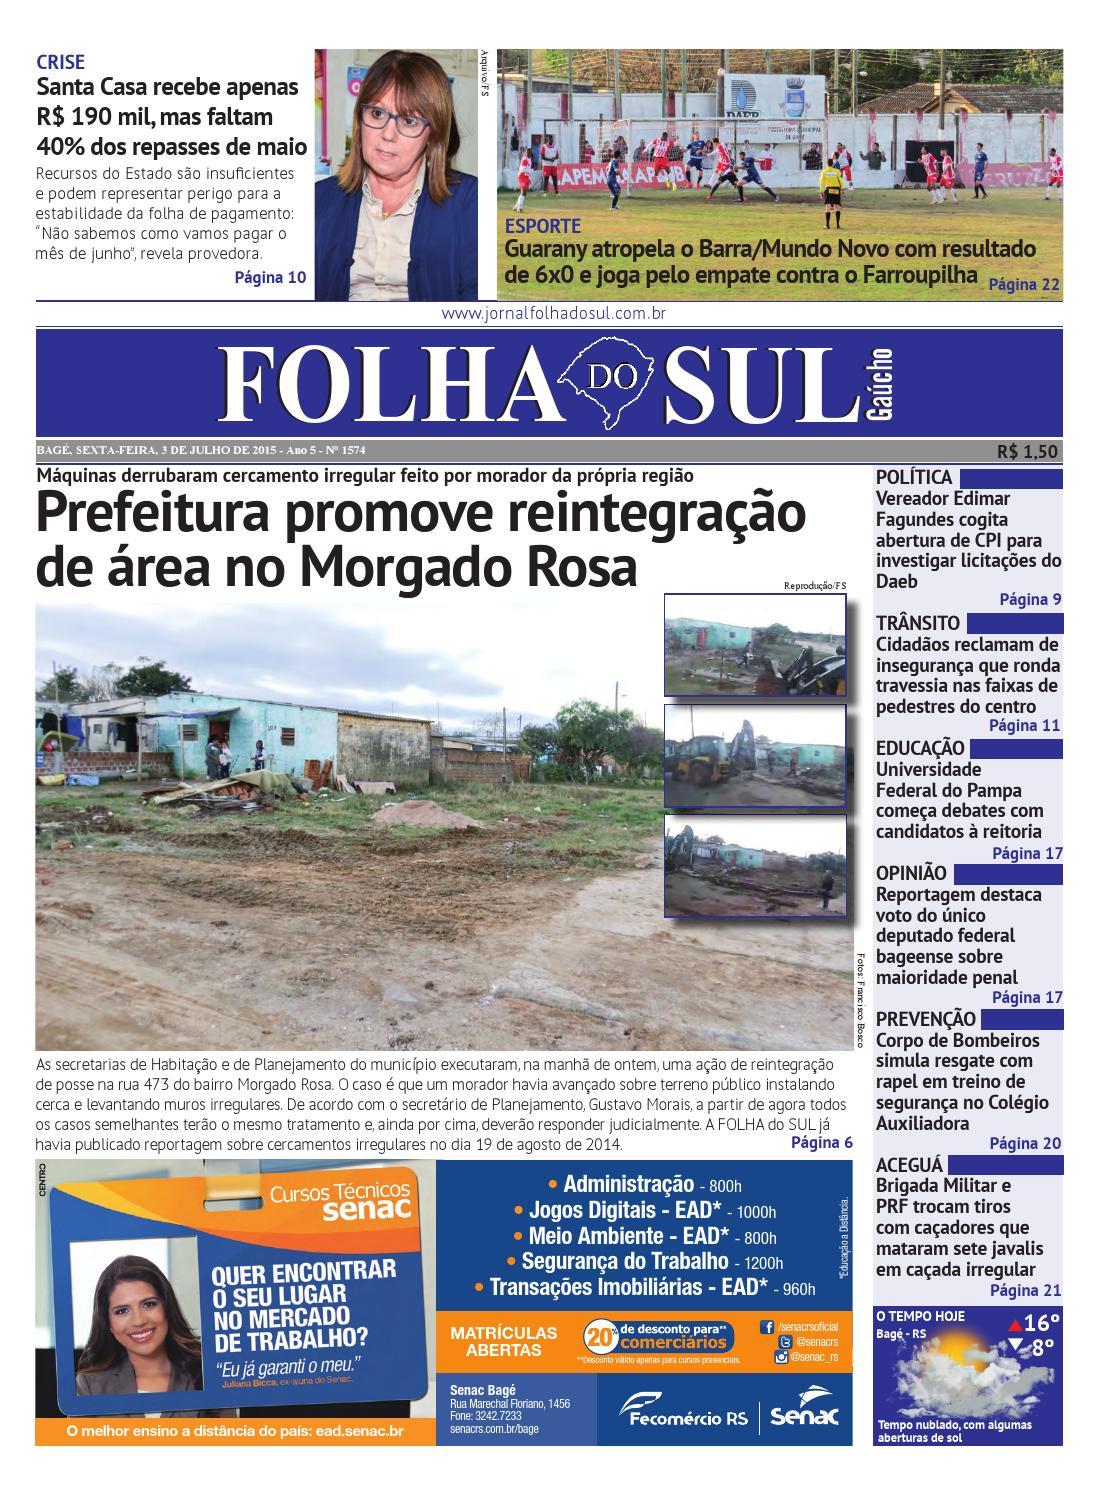 Jornal Folha do Sul, 3 de julho de 2015 by Folha do Sul Gaúcho - issuu fcb9f0a8b7